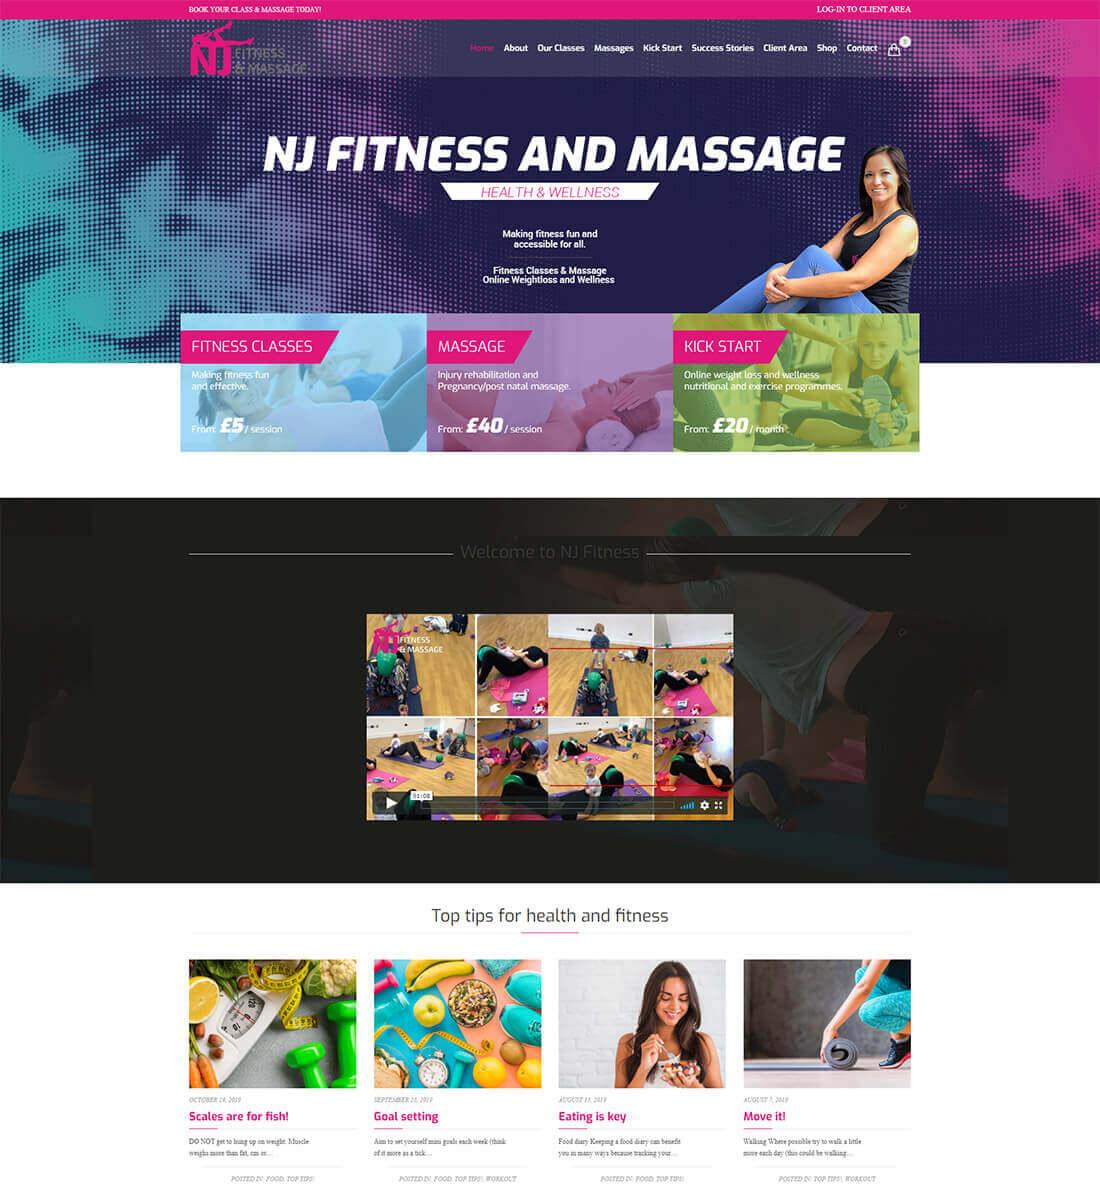 Nj Fitness and Massage - Web Design